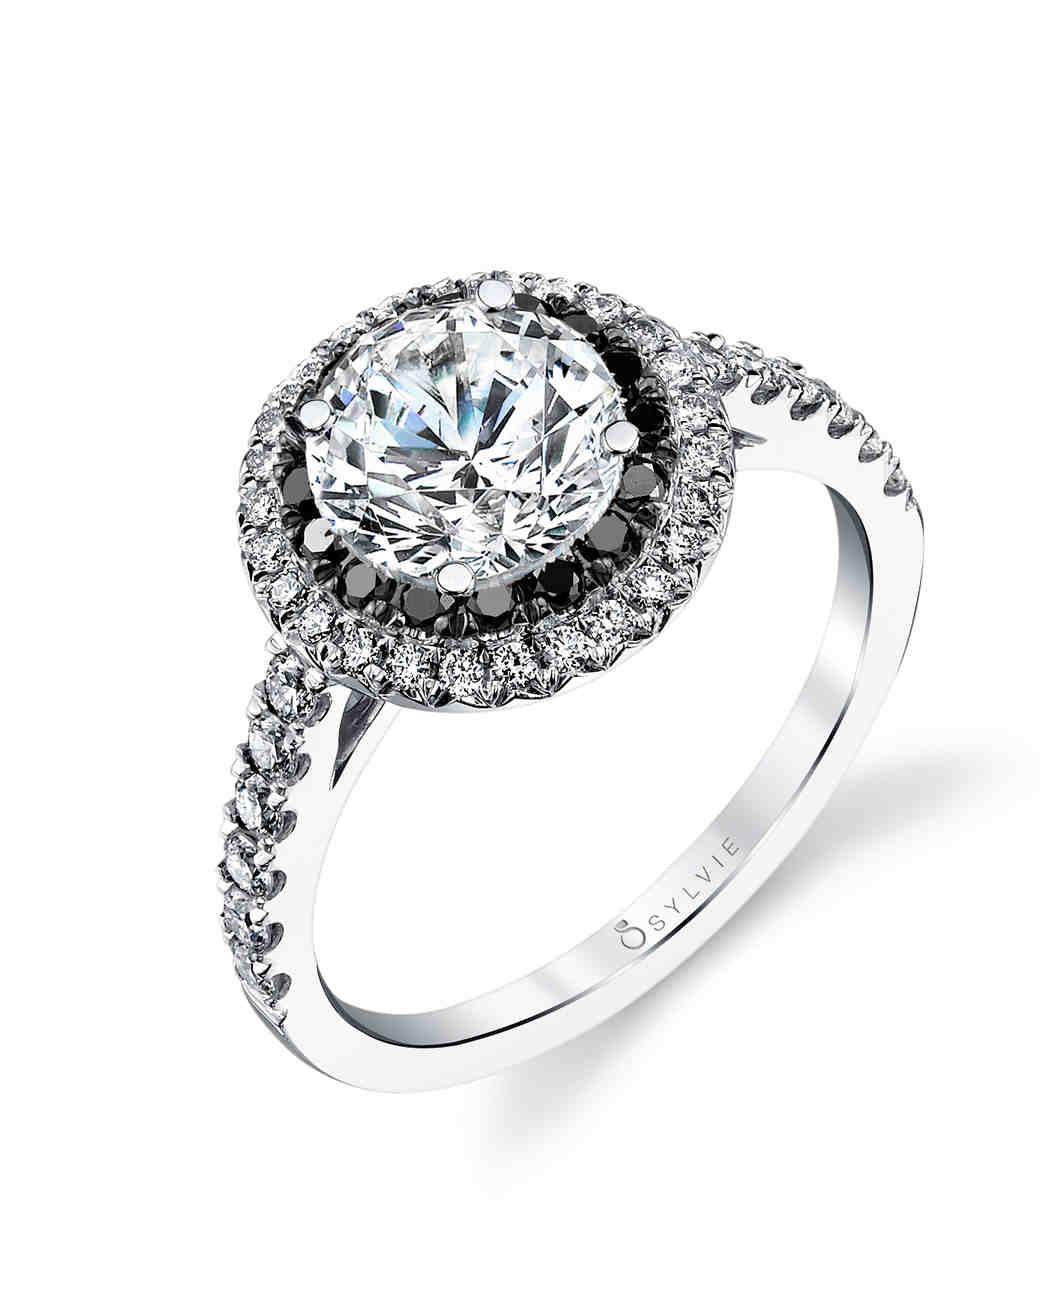 The New LBD: The Little Black Diamond Engagement Ring | Martha Stewart  Weddings